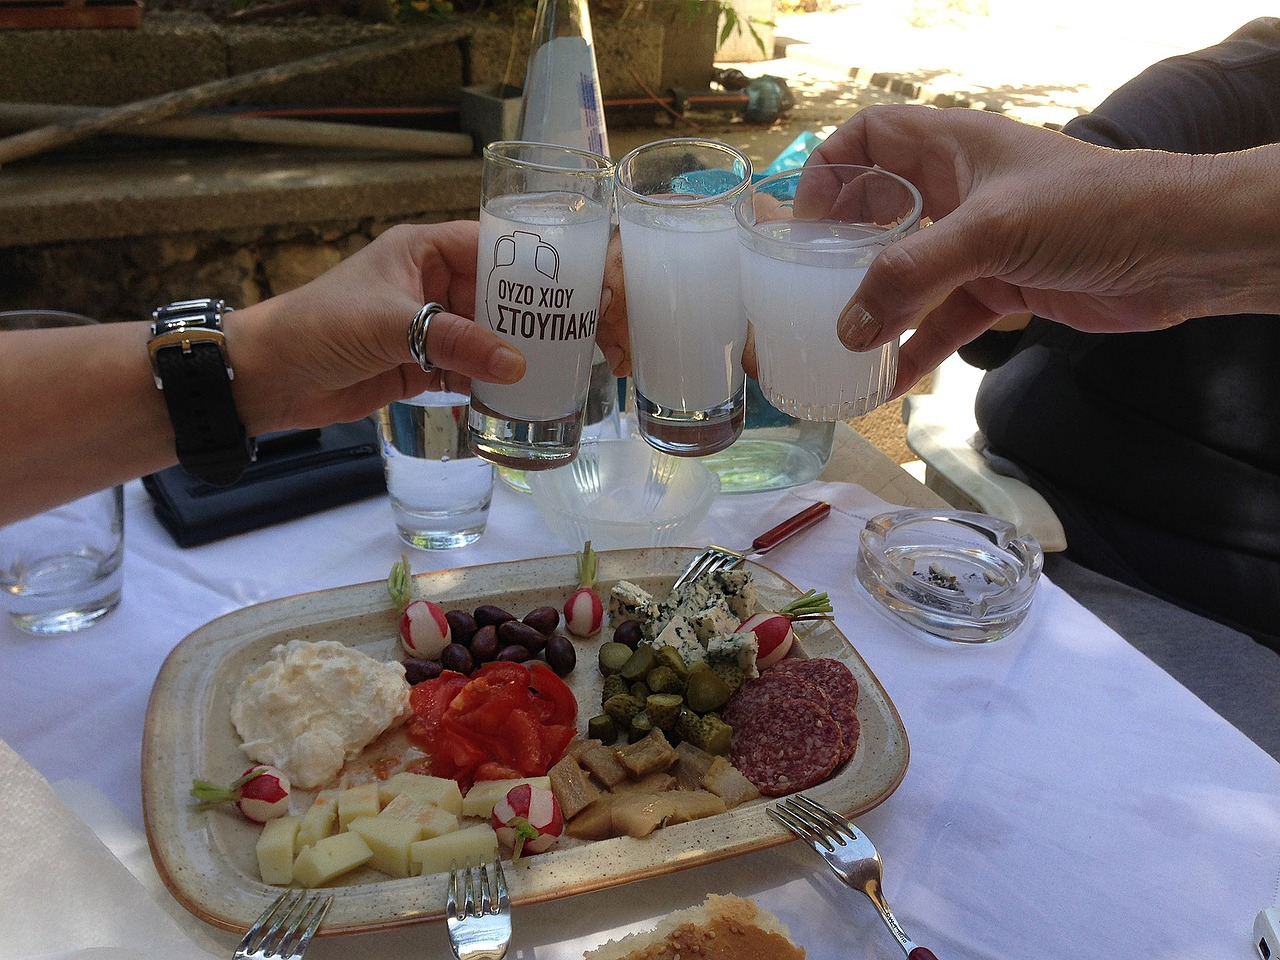 grčka, rakija, pice, tradicija,